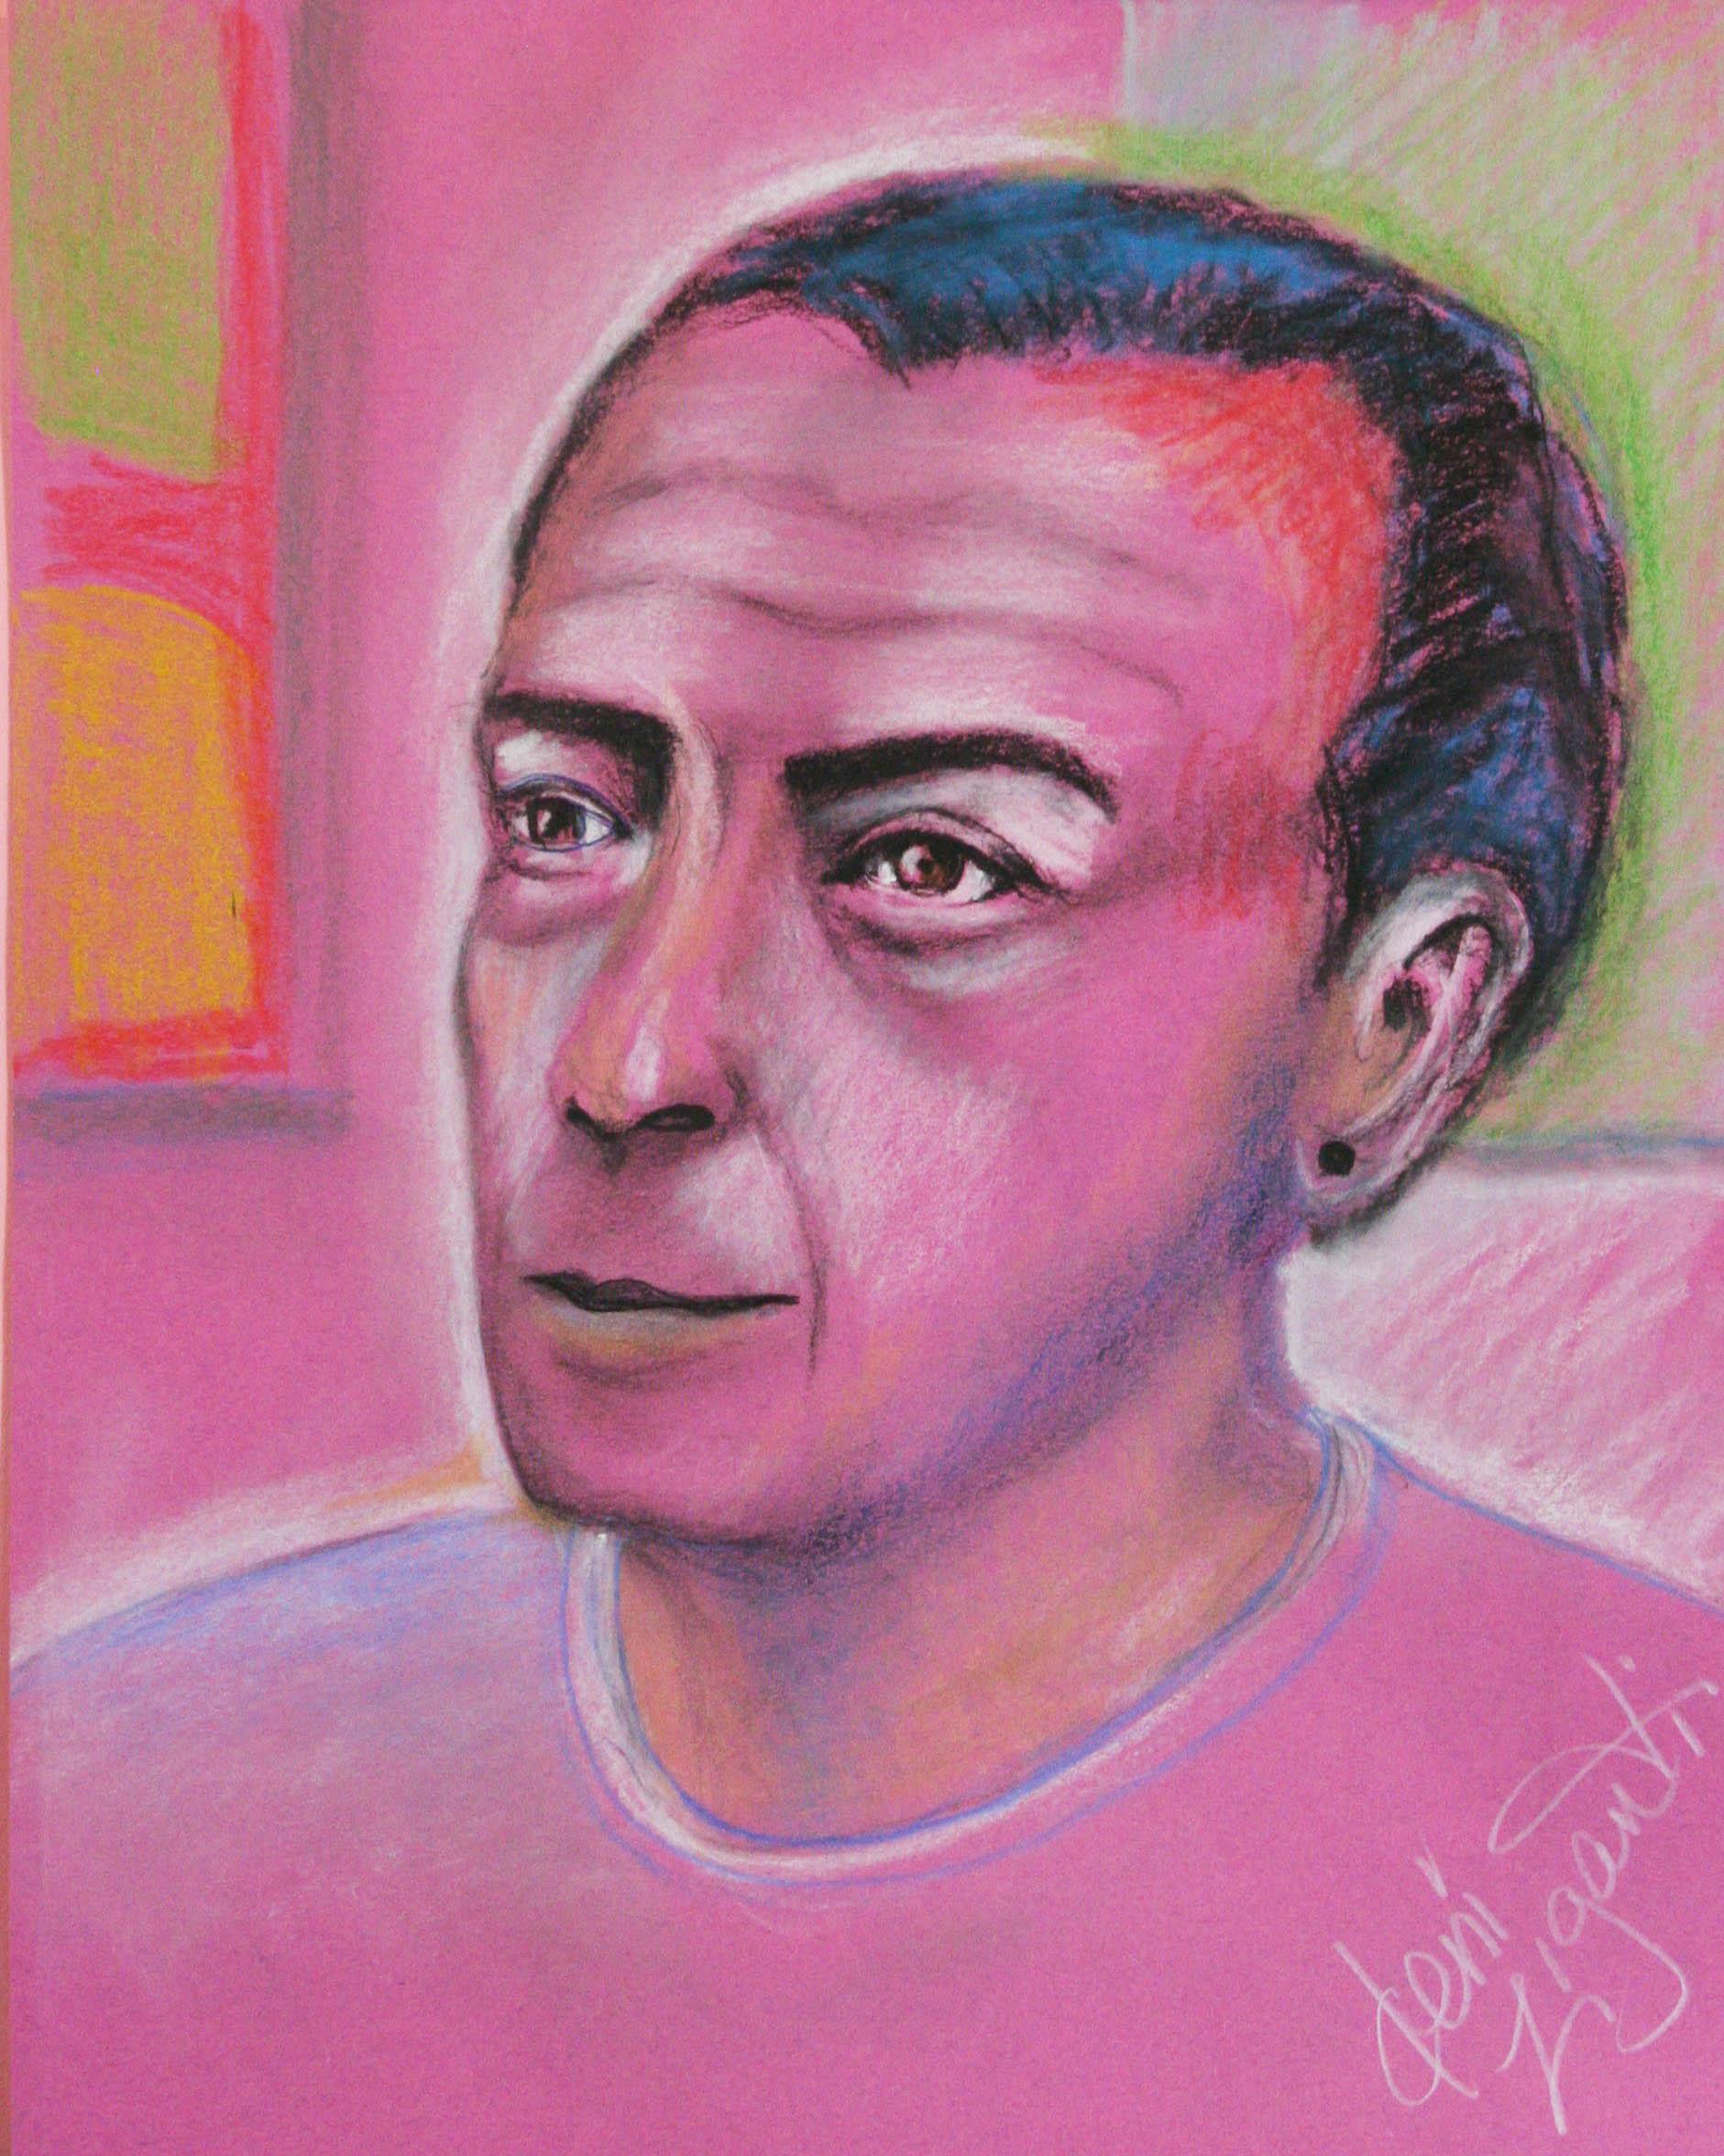 Deni Ziganti did this pastel drawing.